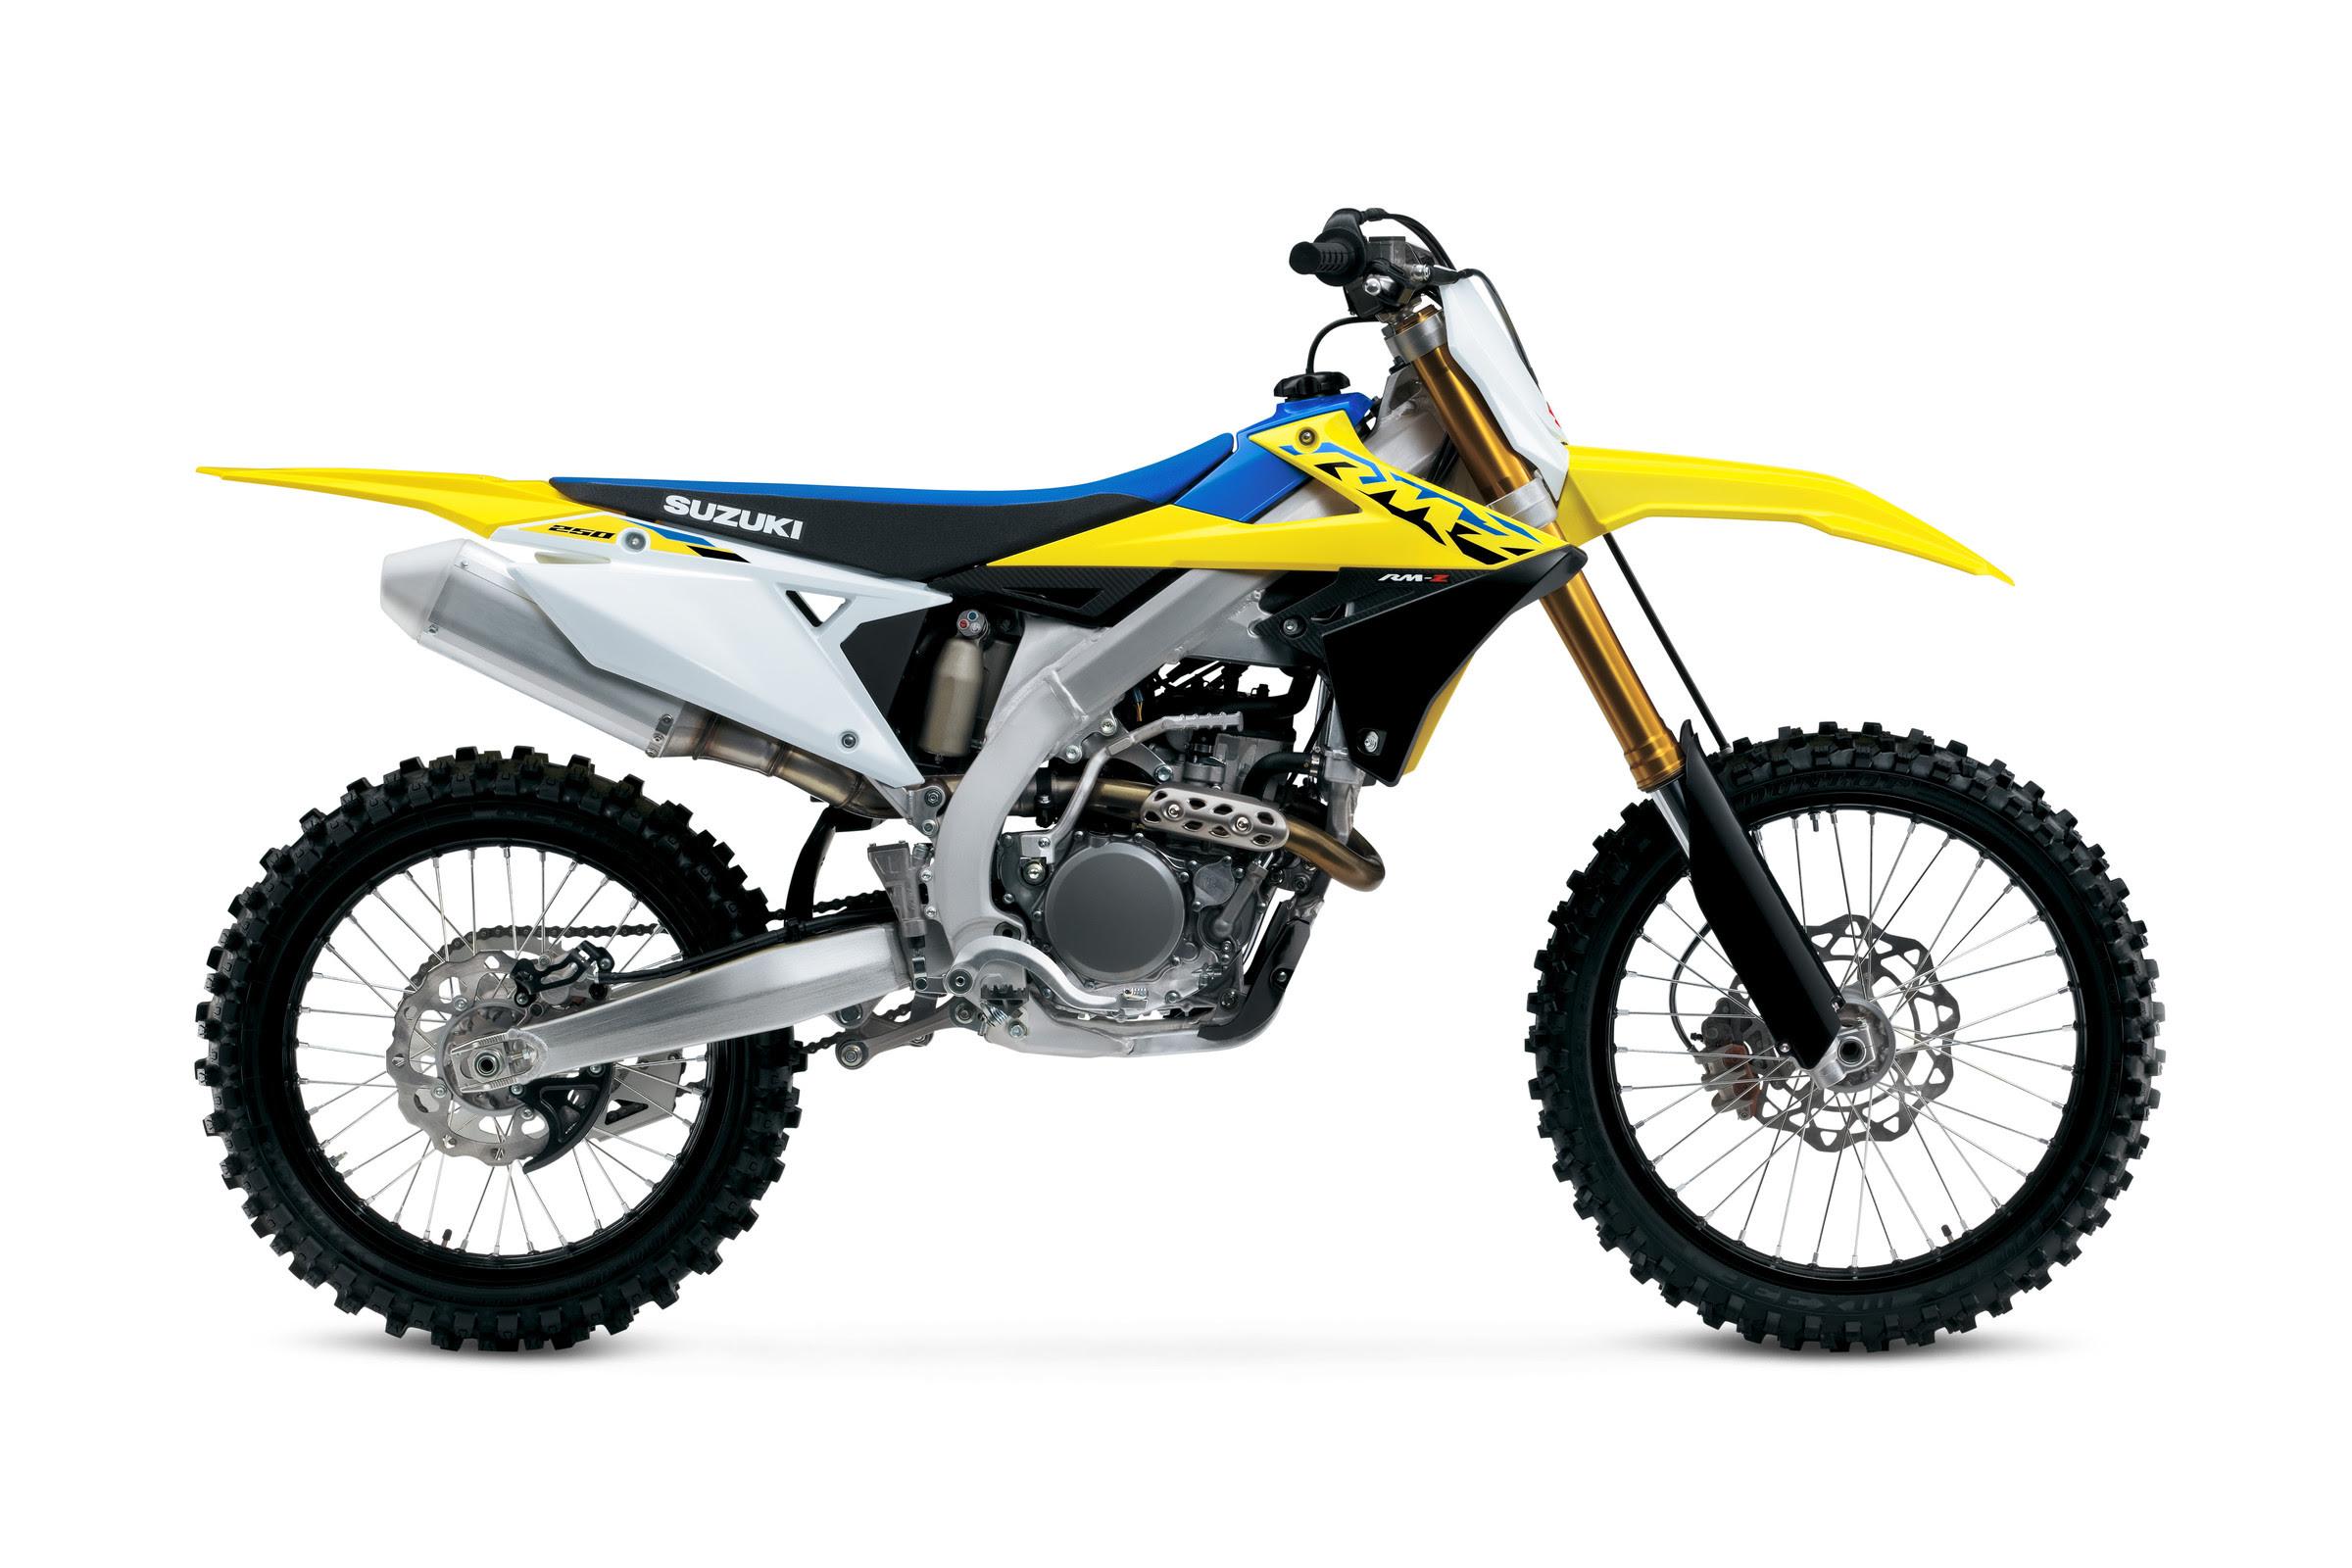 2022 Suzuki RM-Z450 and RM-Z250 Motocross Models